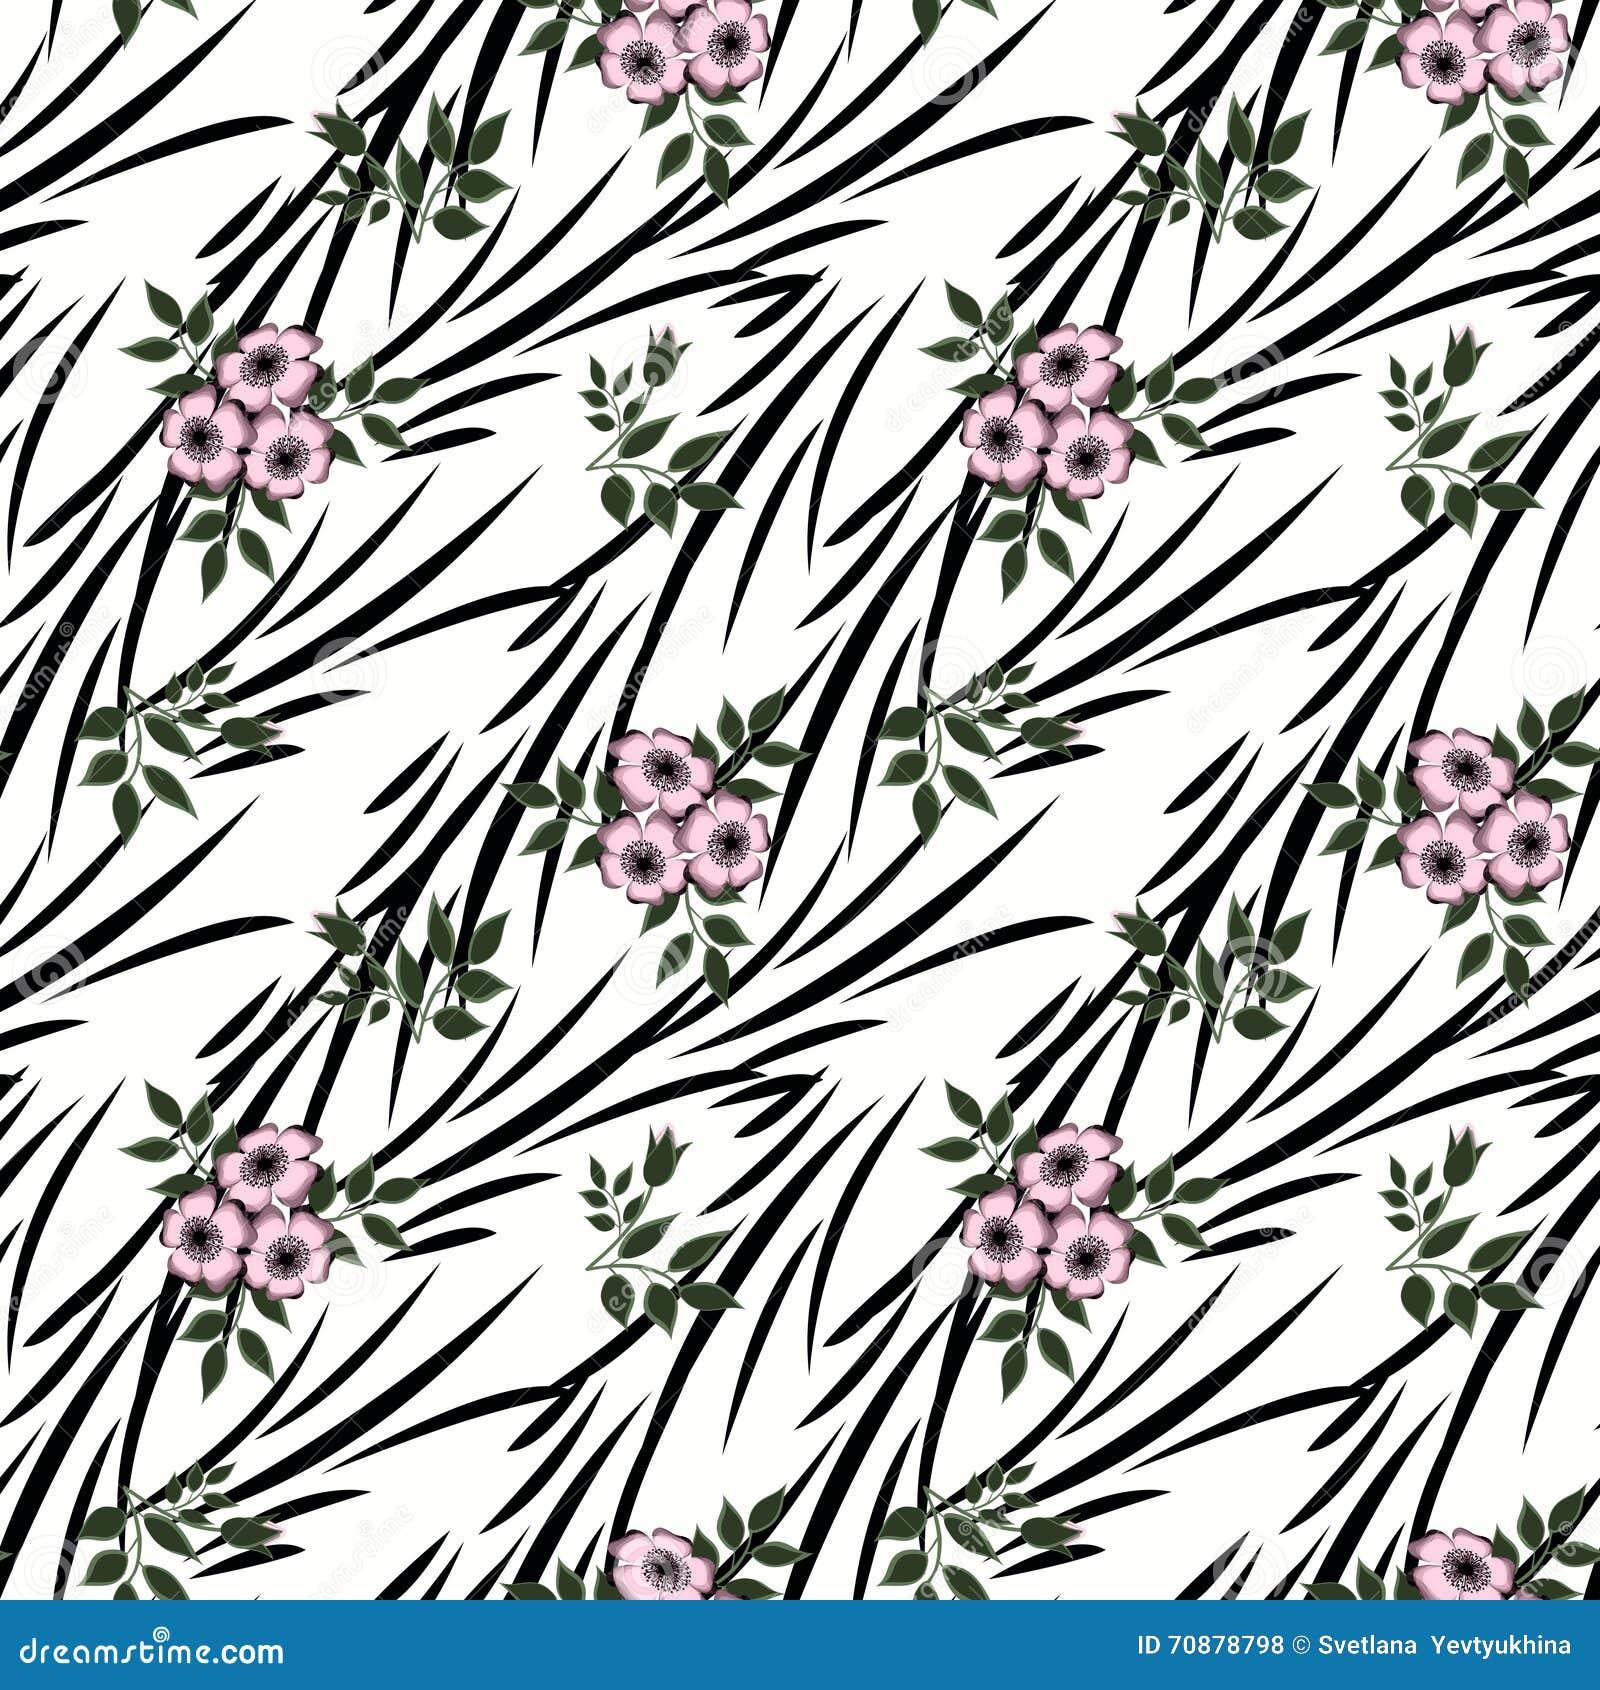 Floral seamless pattern cute cartoon flowers white stripe floral seamless pattern in retro style cute cartoon flowers white stripe background izmirmasajfo